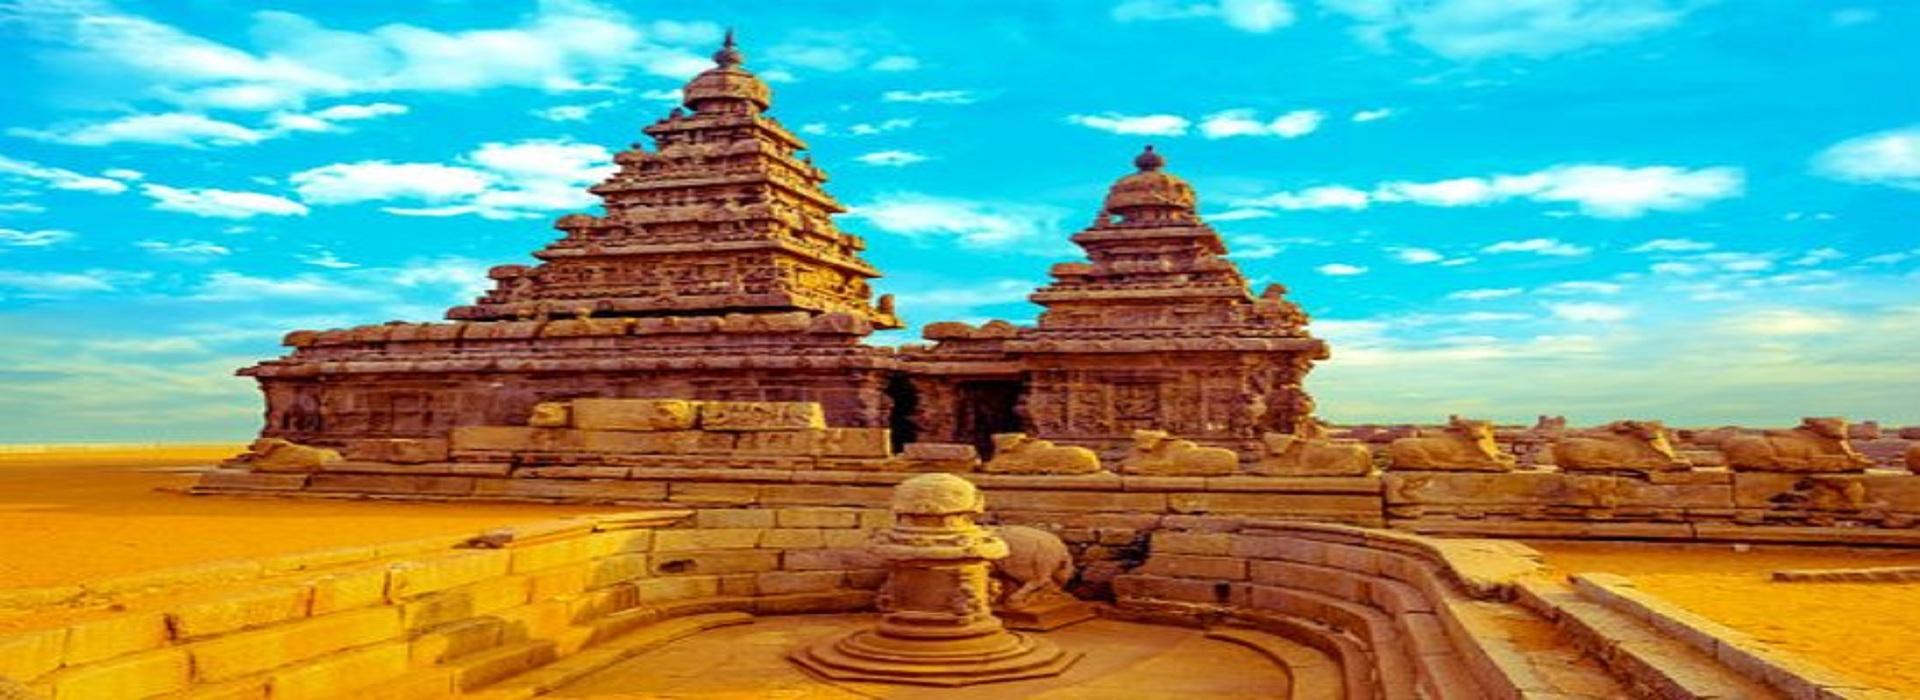 Explore Chennai Tours & Activities